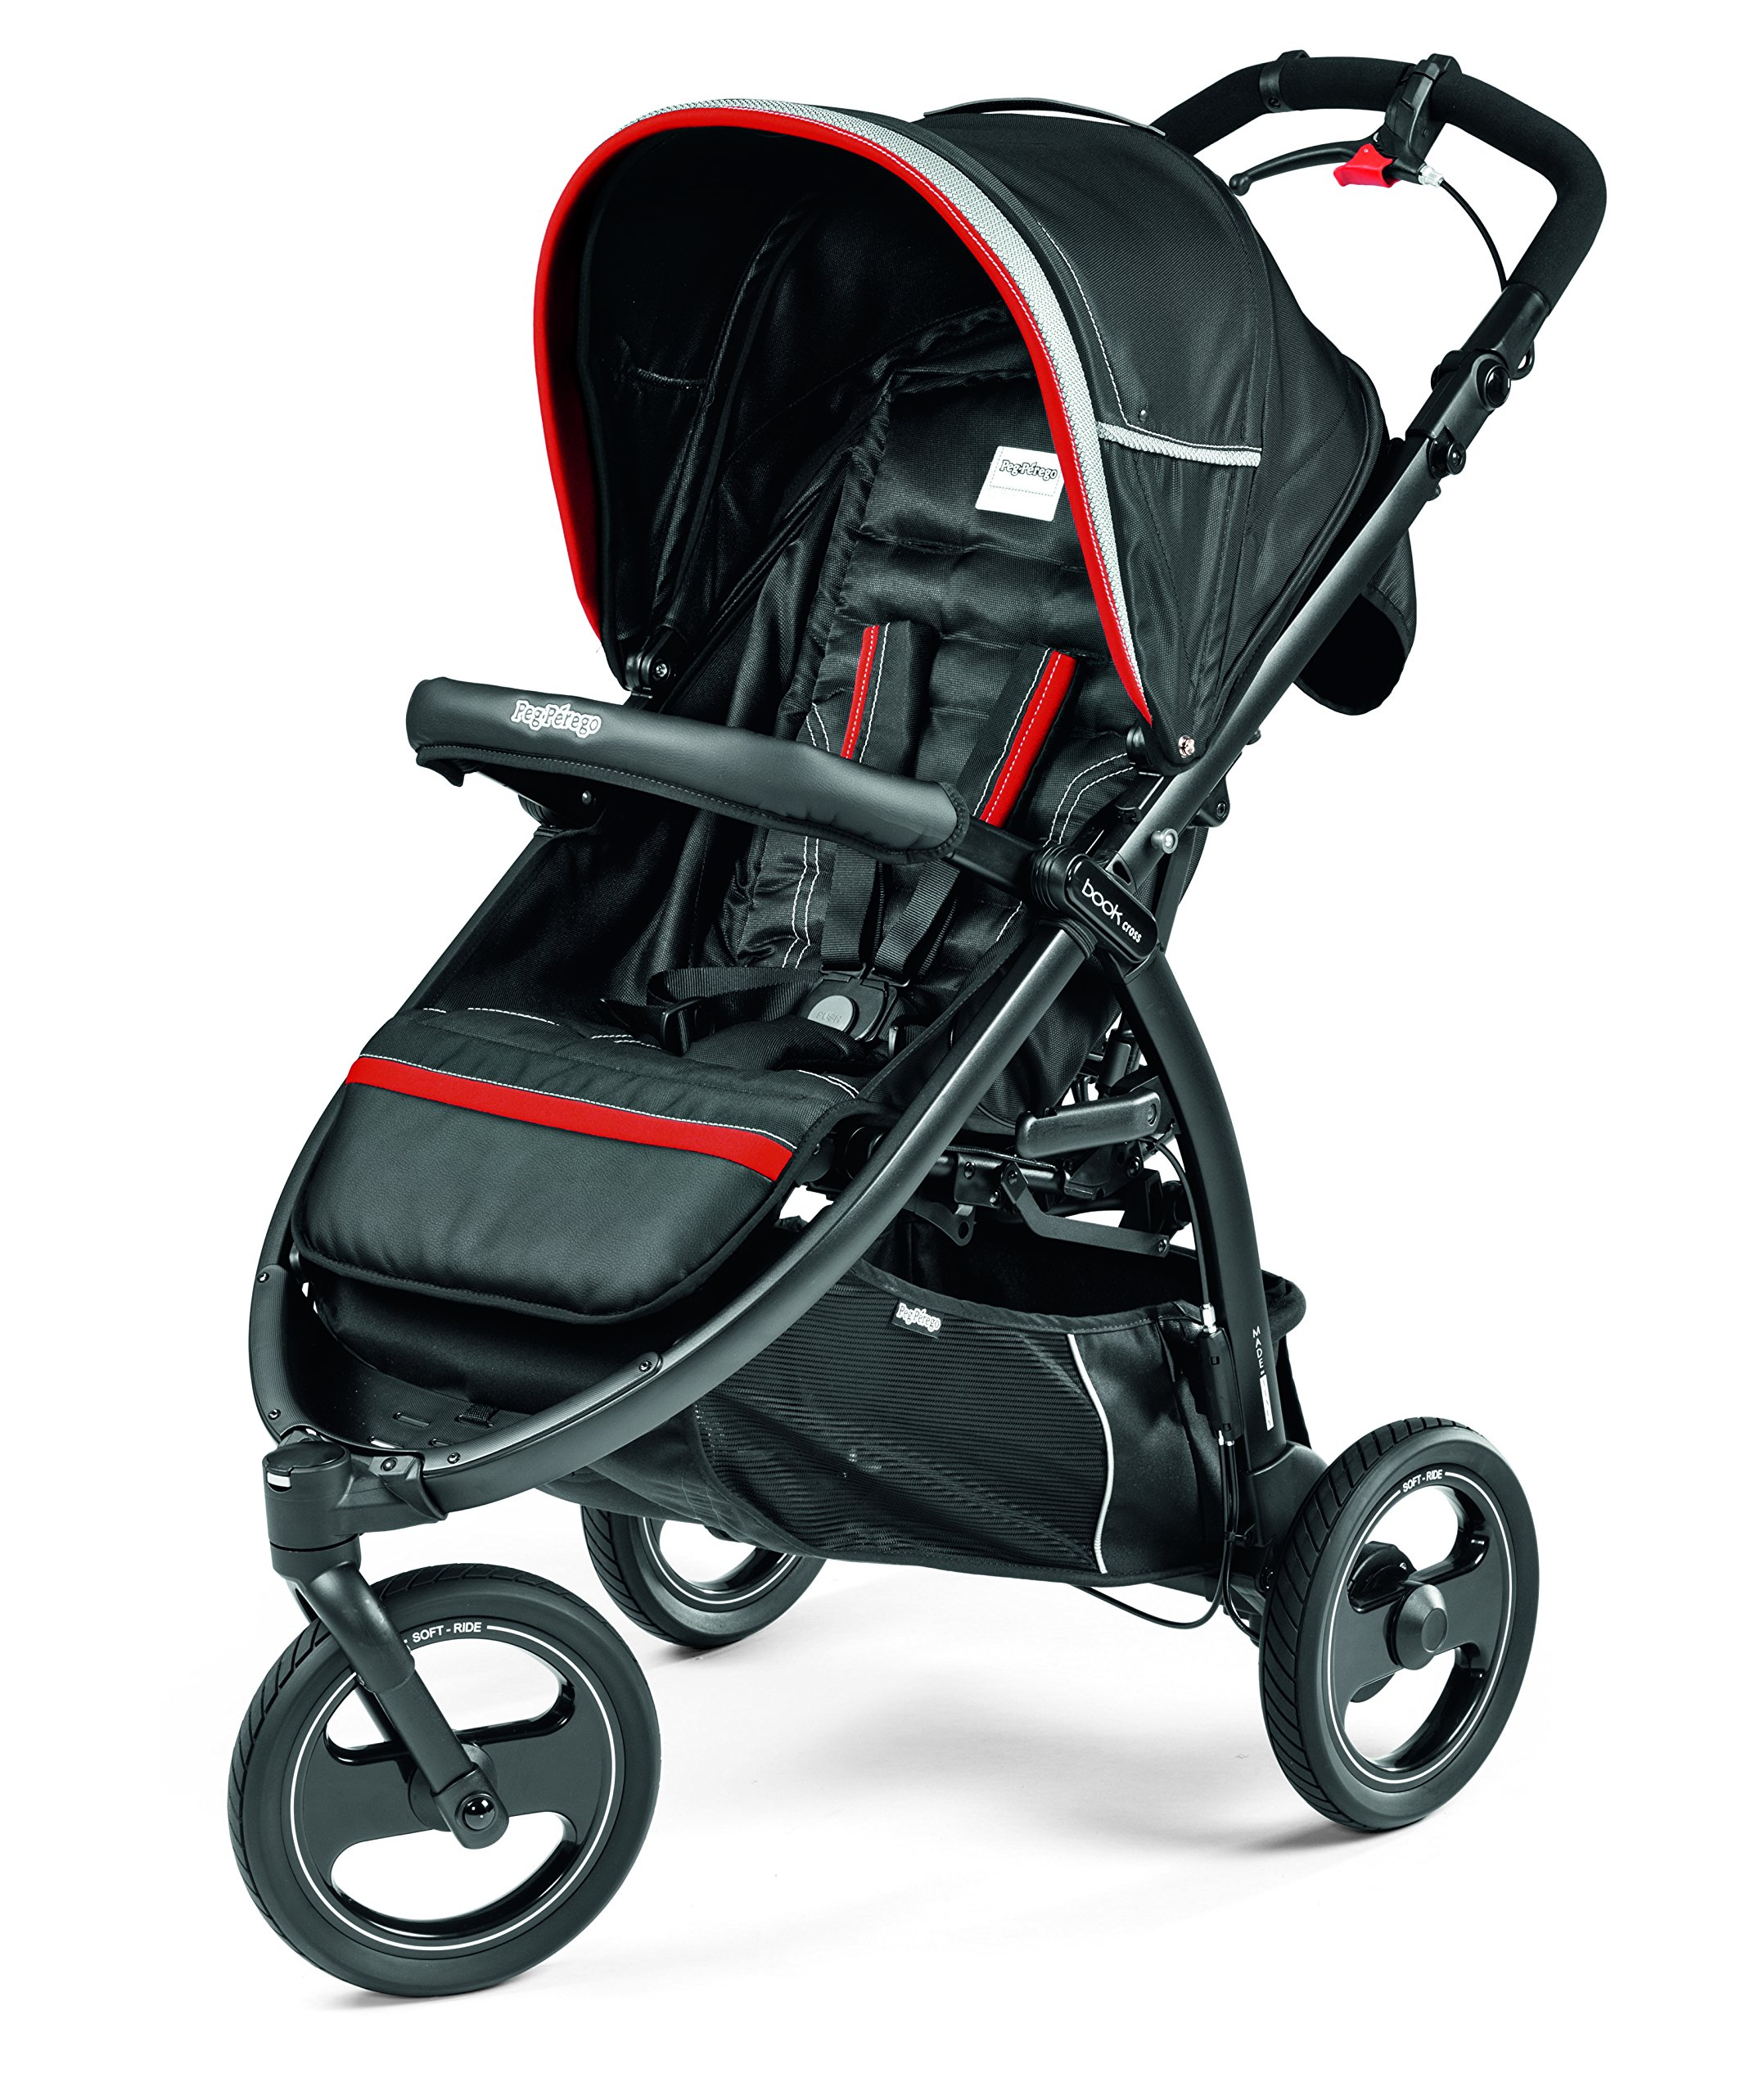 Peg Perego Book Cross Baby Stroller, Synergy by Peg Perego